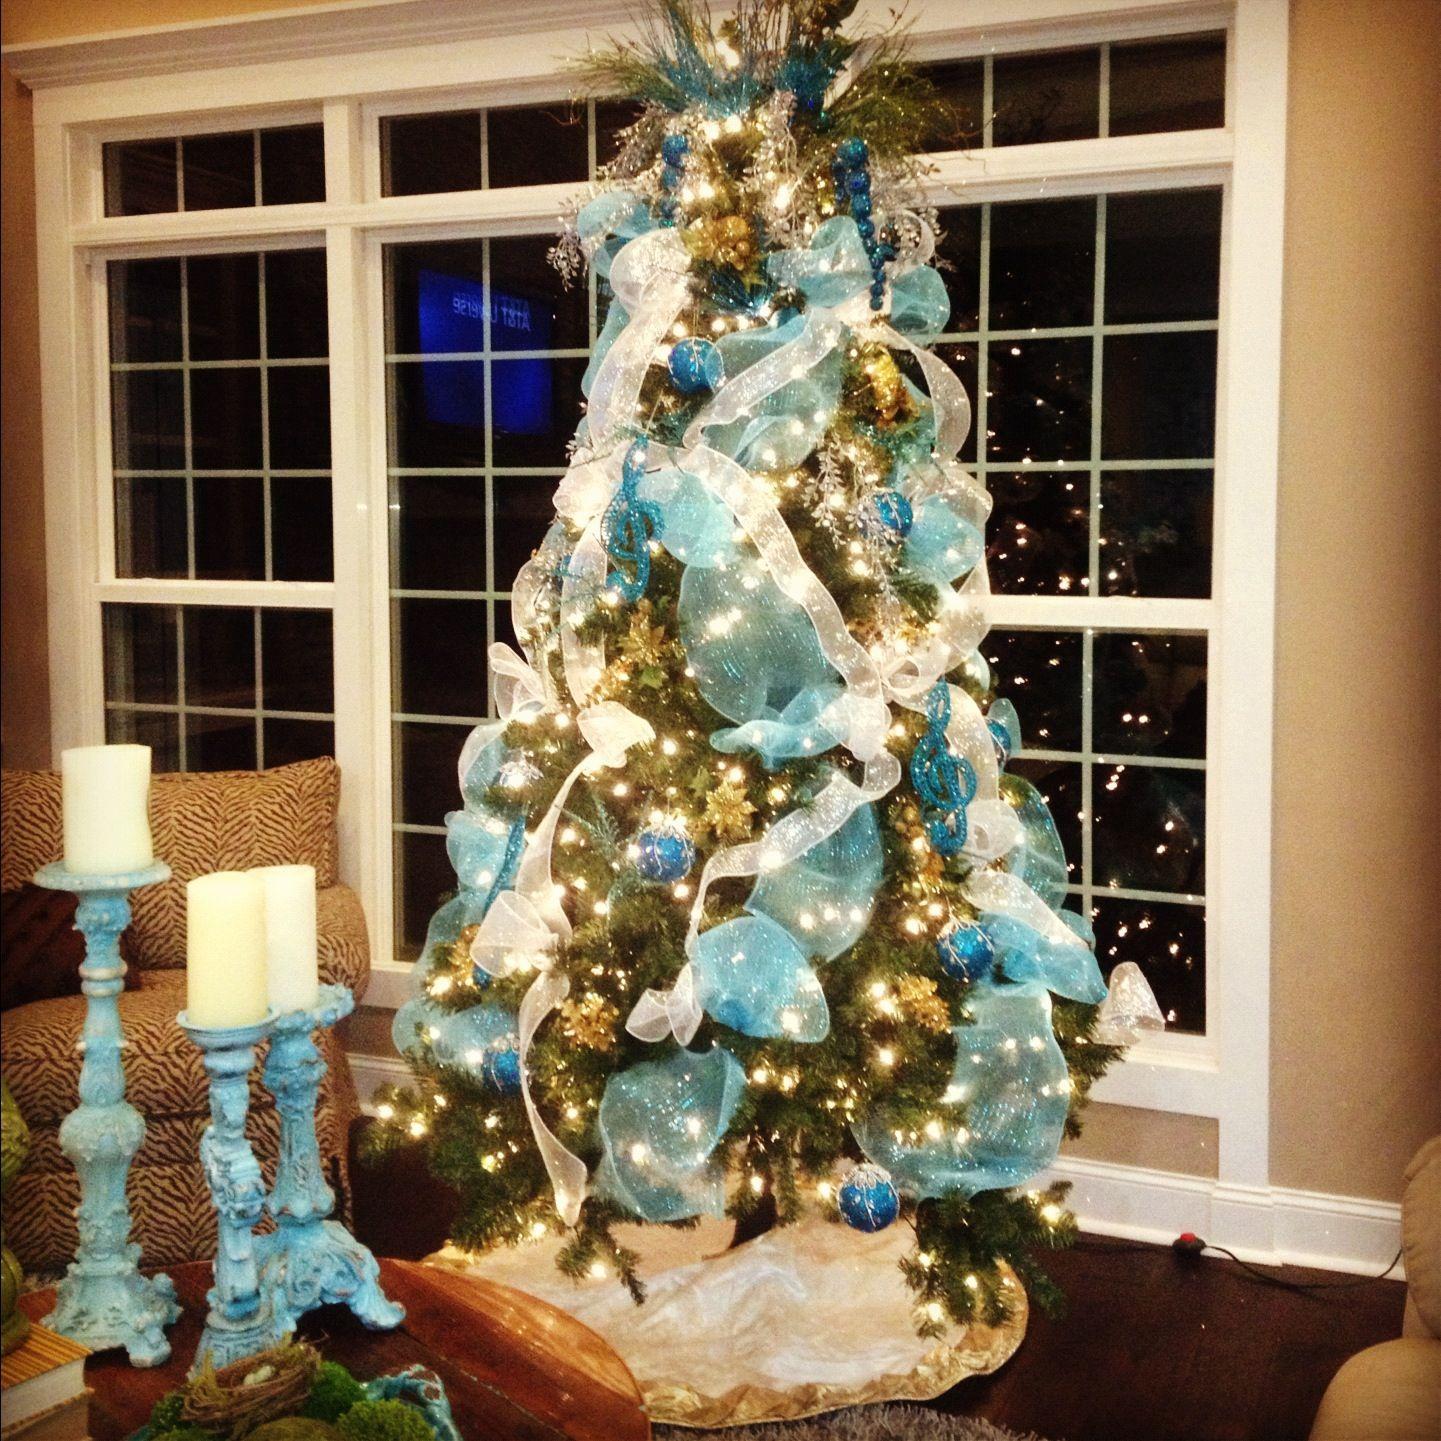 Turquoise And White Christmas Tree: Aqua Christmas Tree Decorations